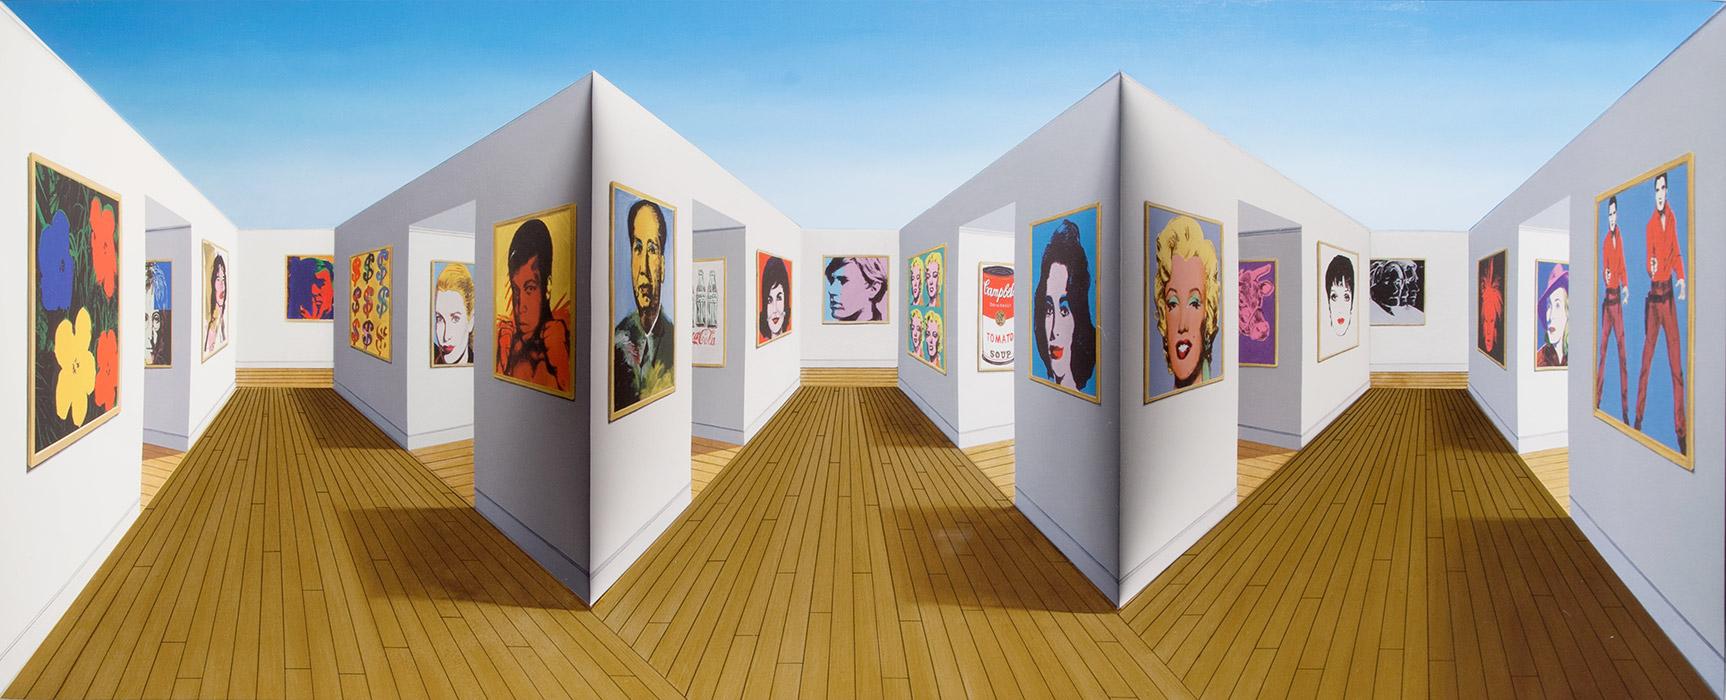 Patrick Hughes illusion